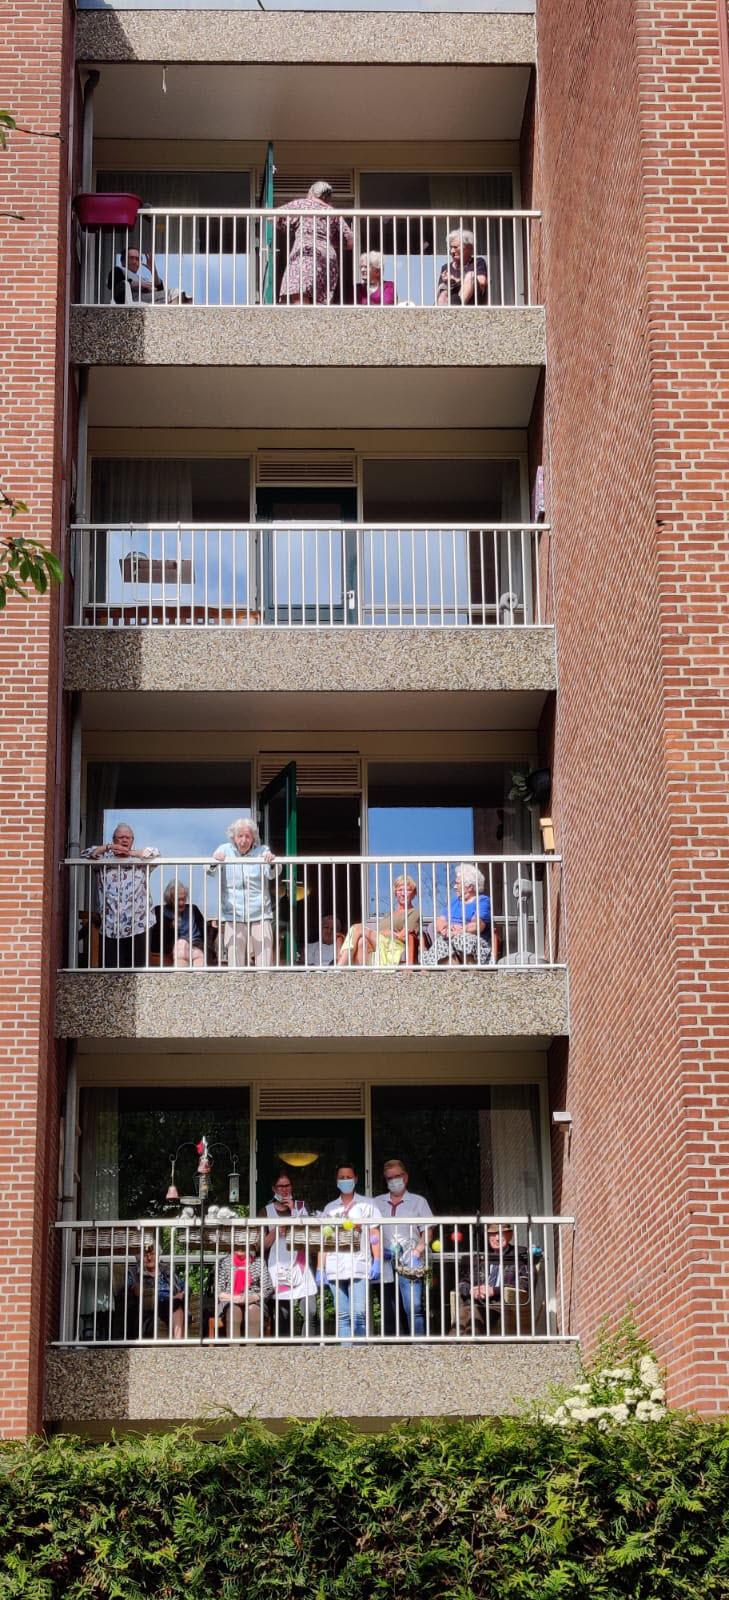 Woonzorgcentrum Weideheem Harderwijk